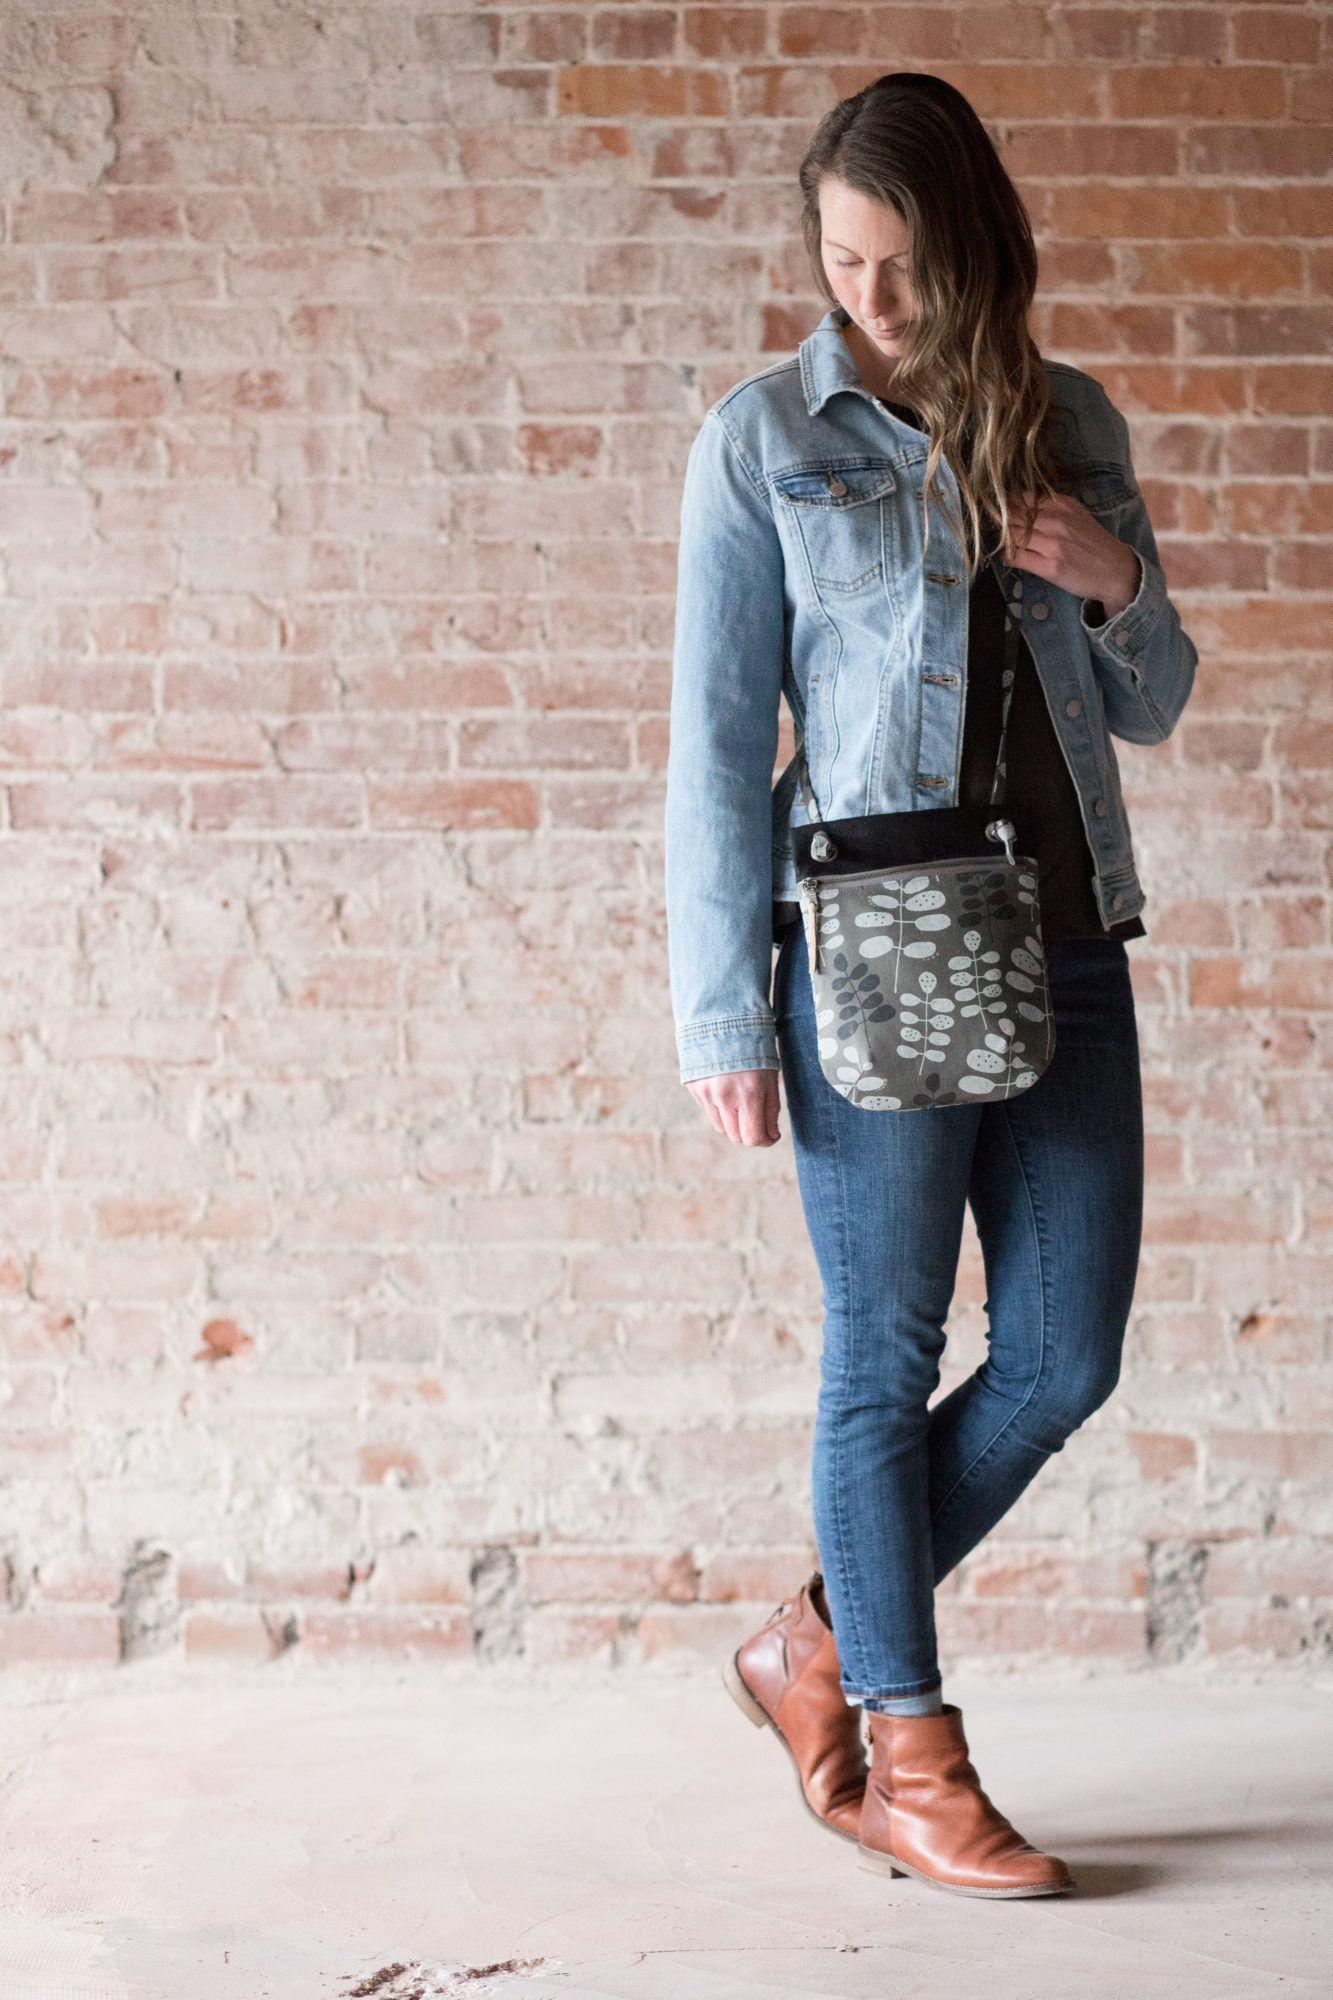 Forage Bag Free Pattern Noodlehead Small Bag Pattern Quilted Bag Patterns Bag Patterns To Sew